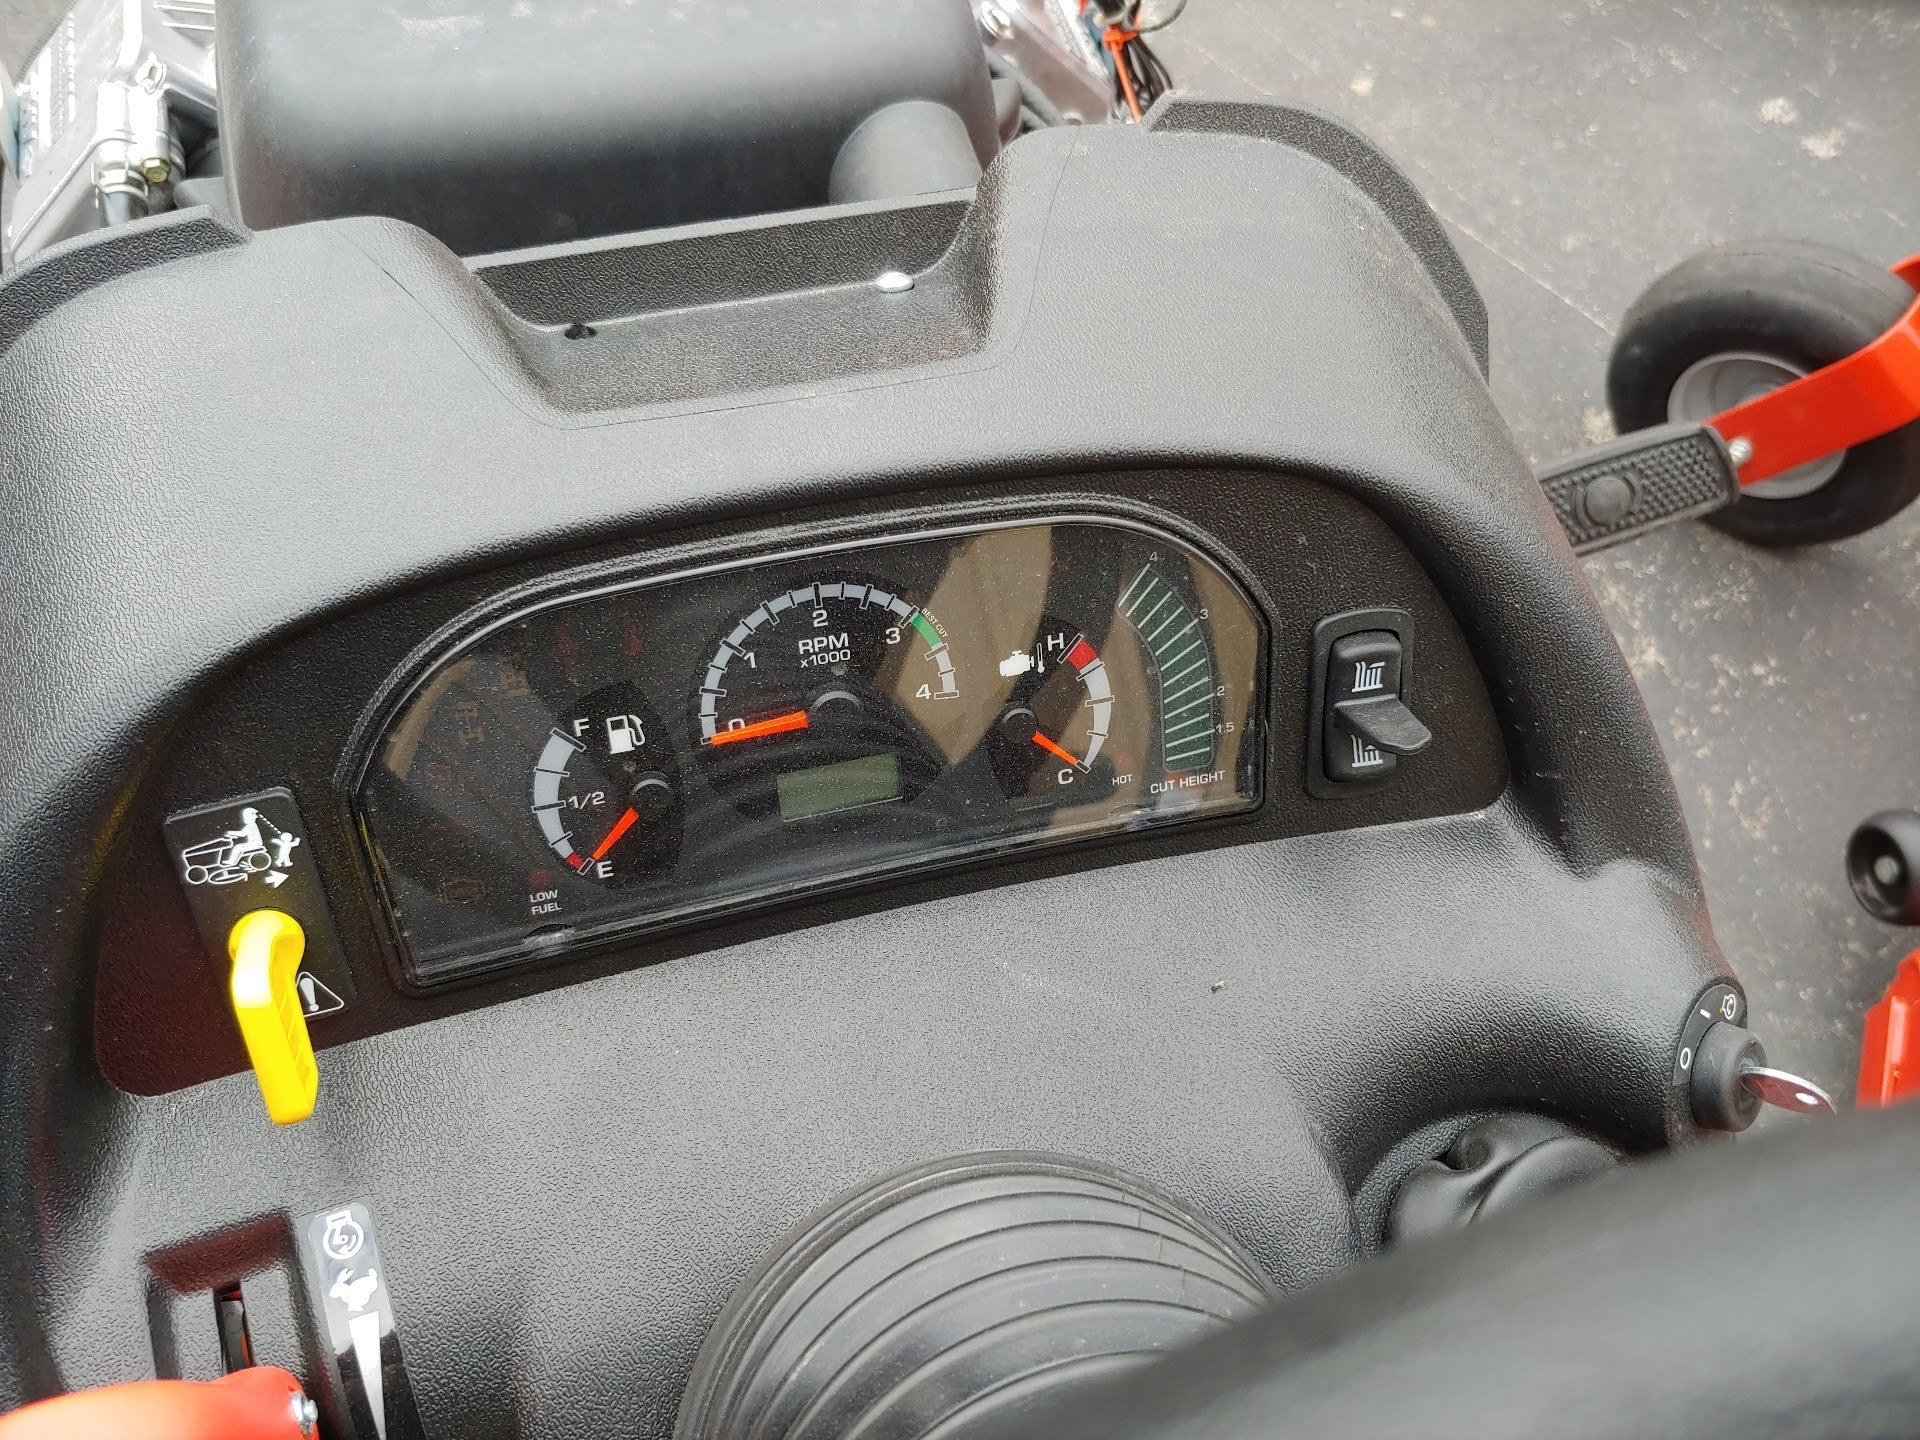 2018  Legacy XL 33 4WD 540 Rear PTO 3